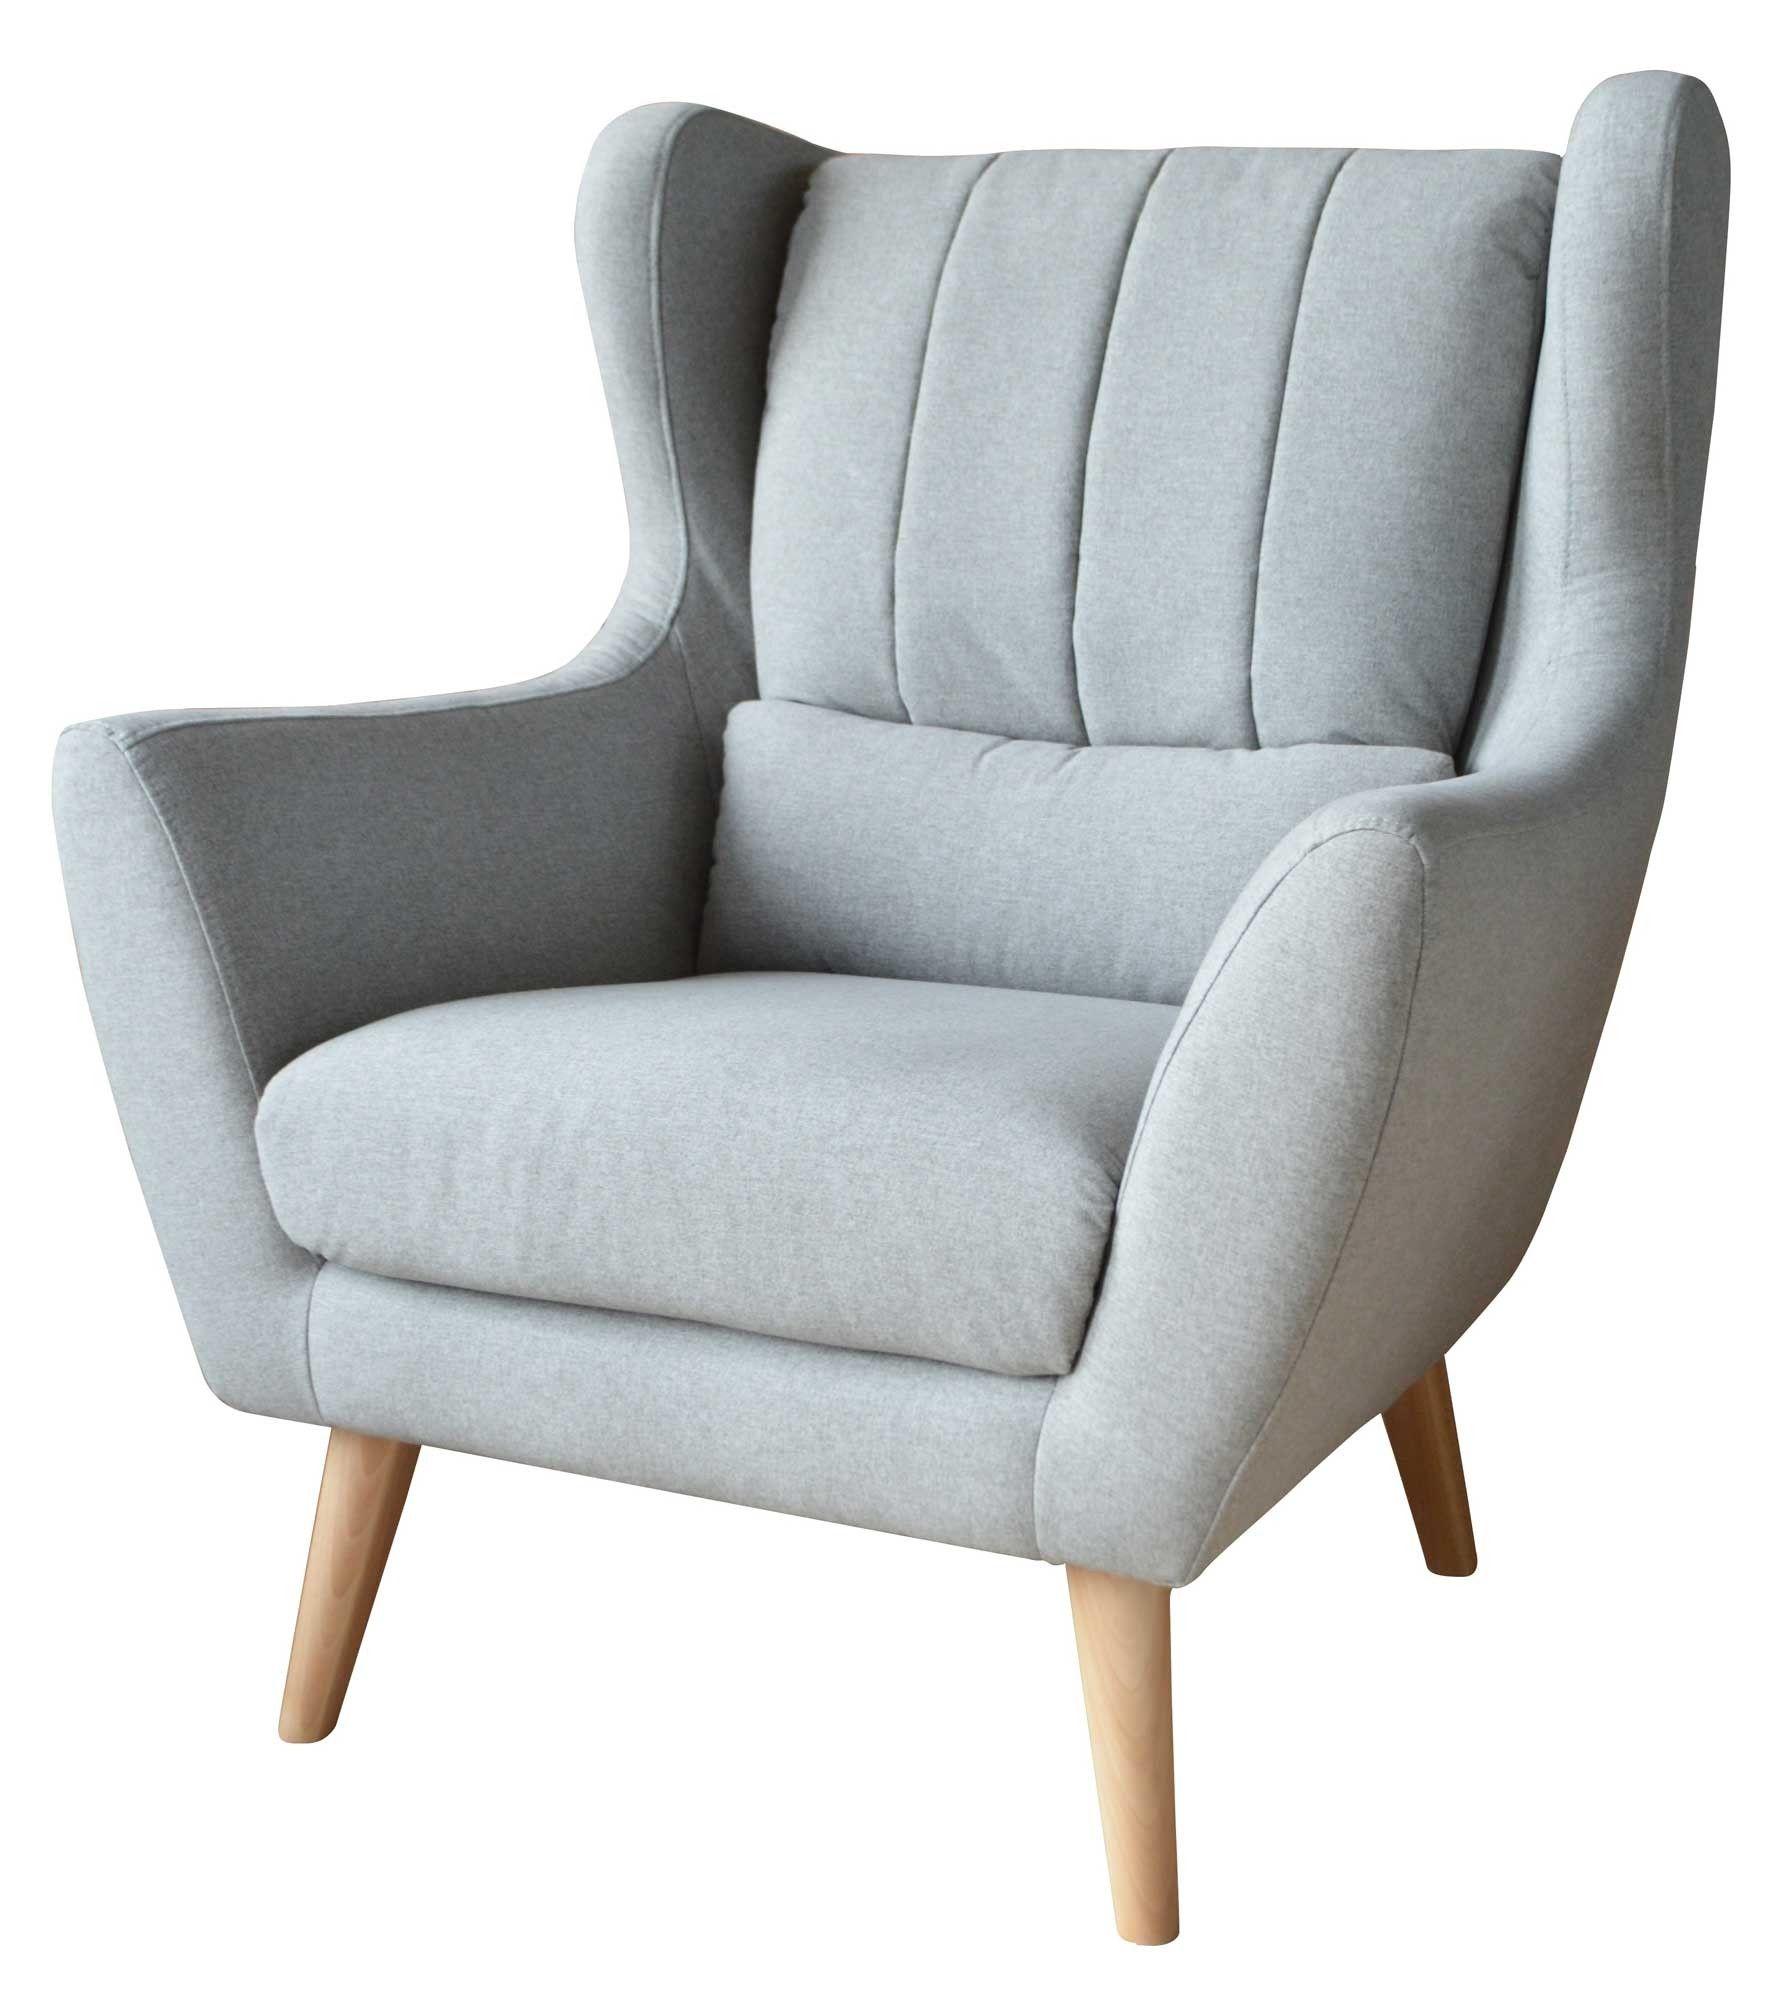 Rebecca Chair | Large furniture, Bath and House